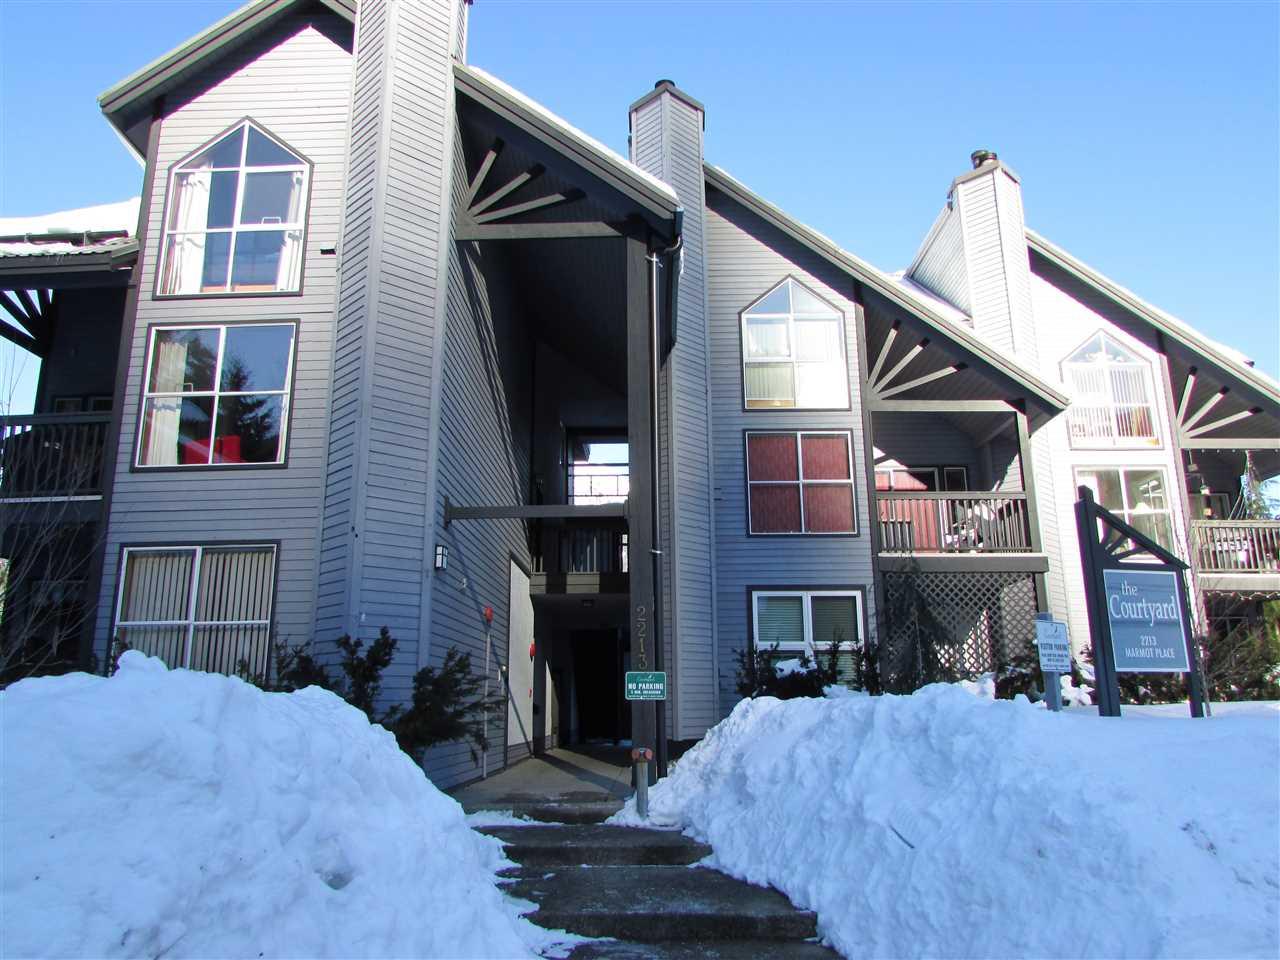 21 2213 MARMOT PLACE, Whistler, BC, V0N 1B2 Primary Photo